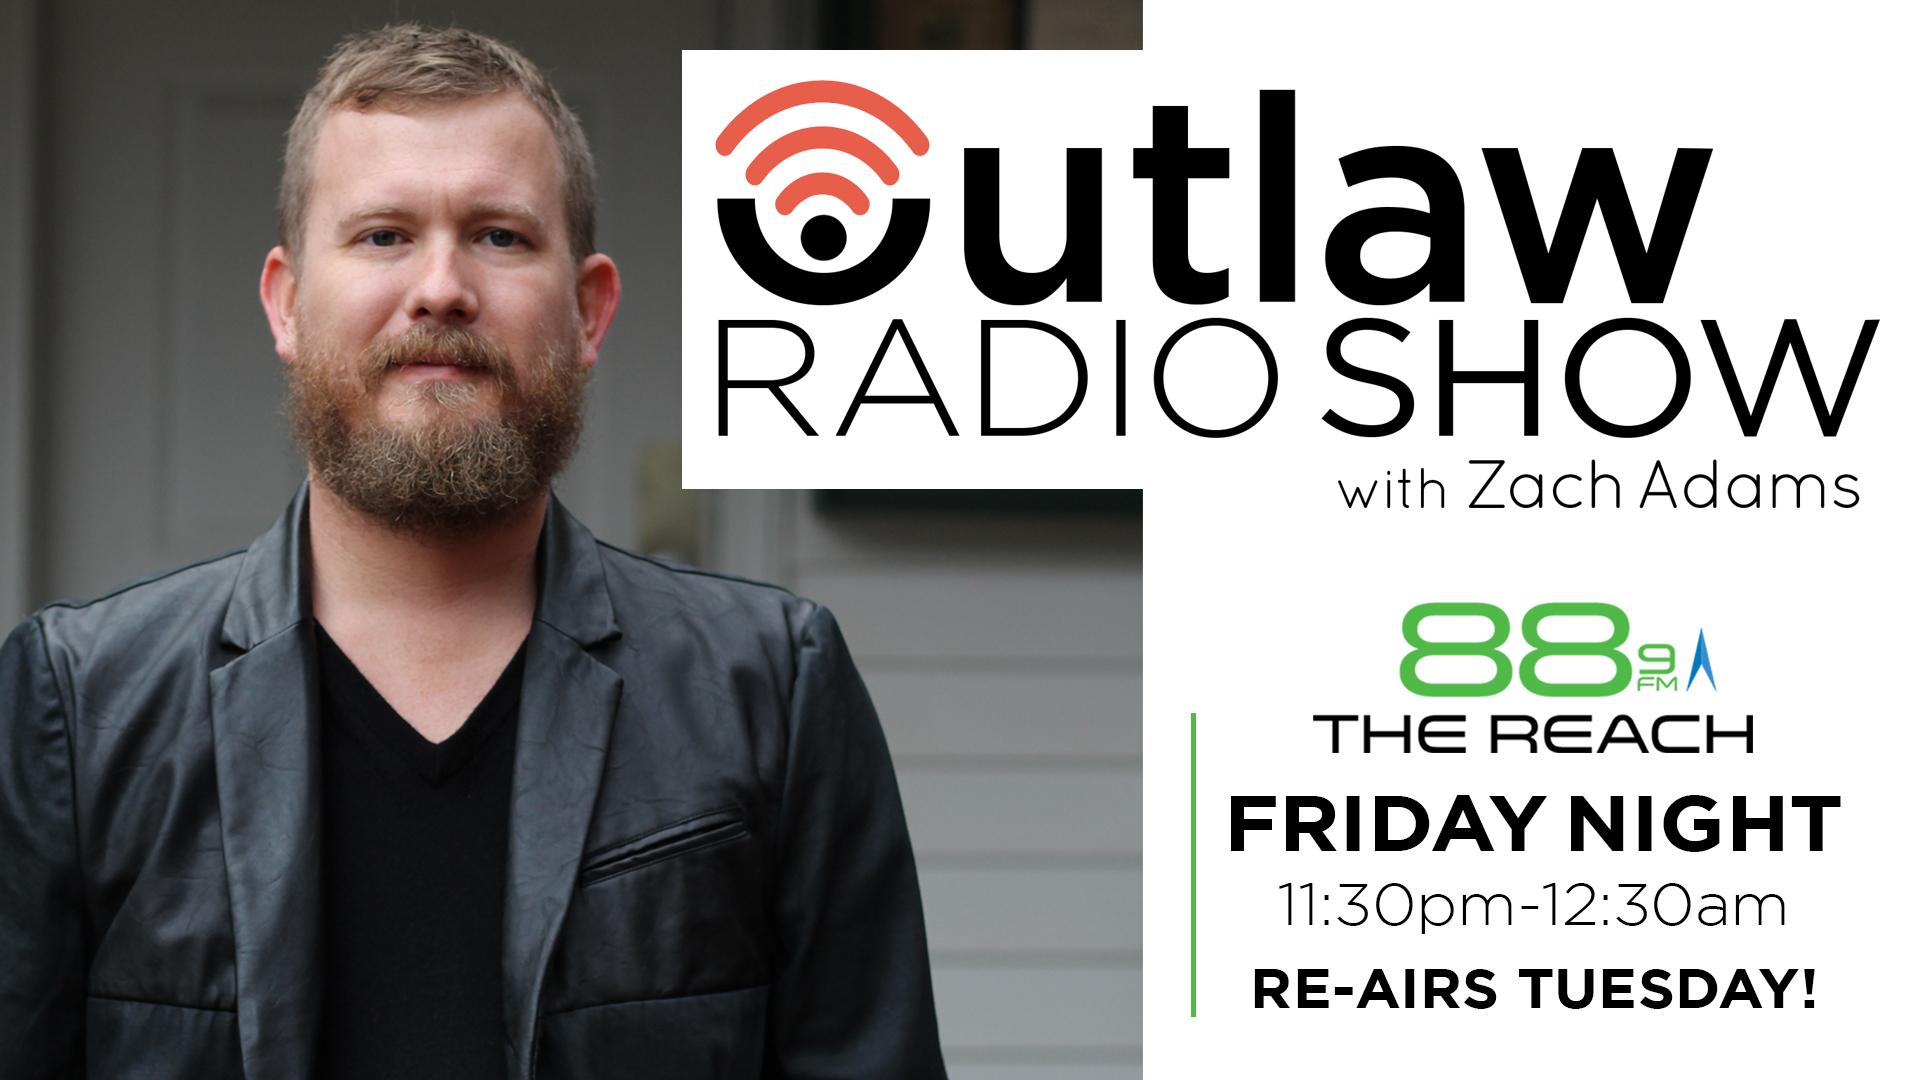 outlawradioshow-2